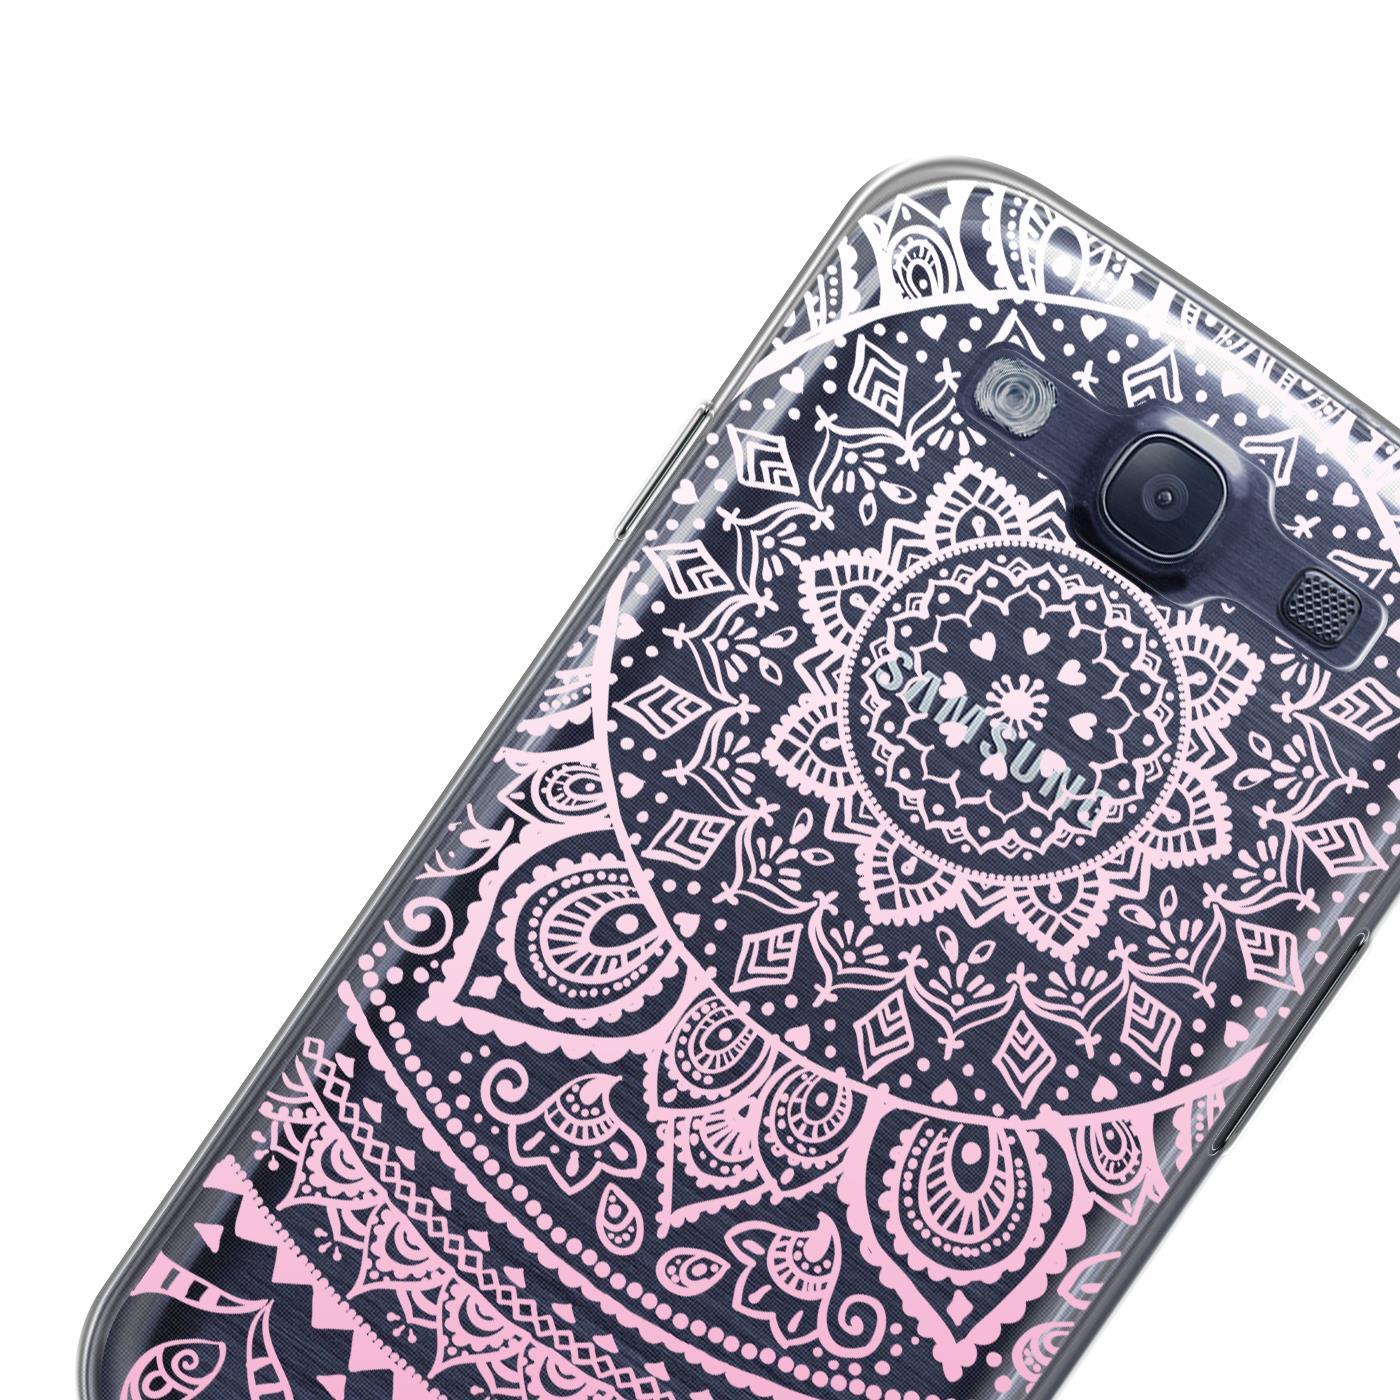 Samsung-Galaxy-S3-Neo-Handy-Schutz-Huelle-Case-TPU-Silikon-Cover-Tasche-Mandala Indexbild 18